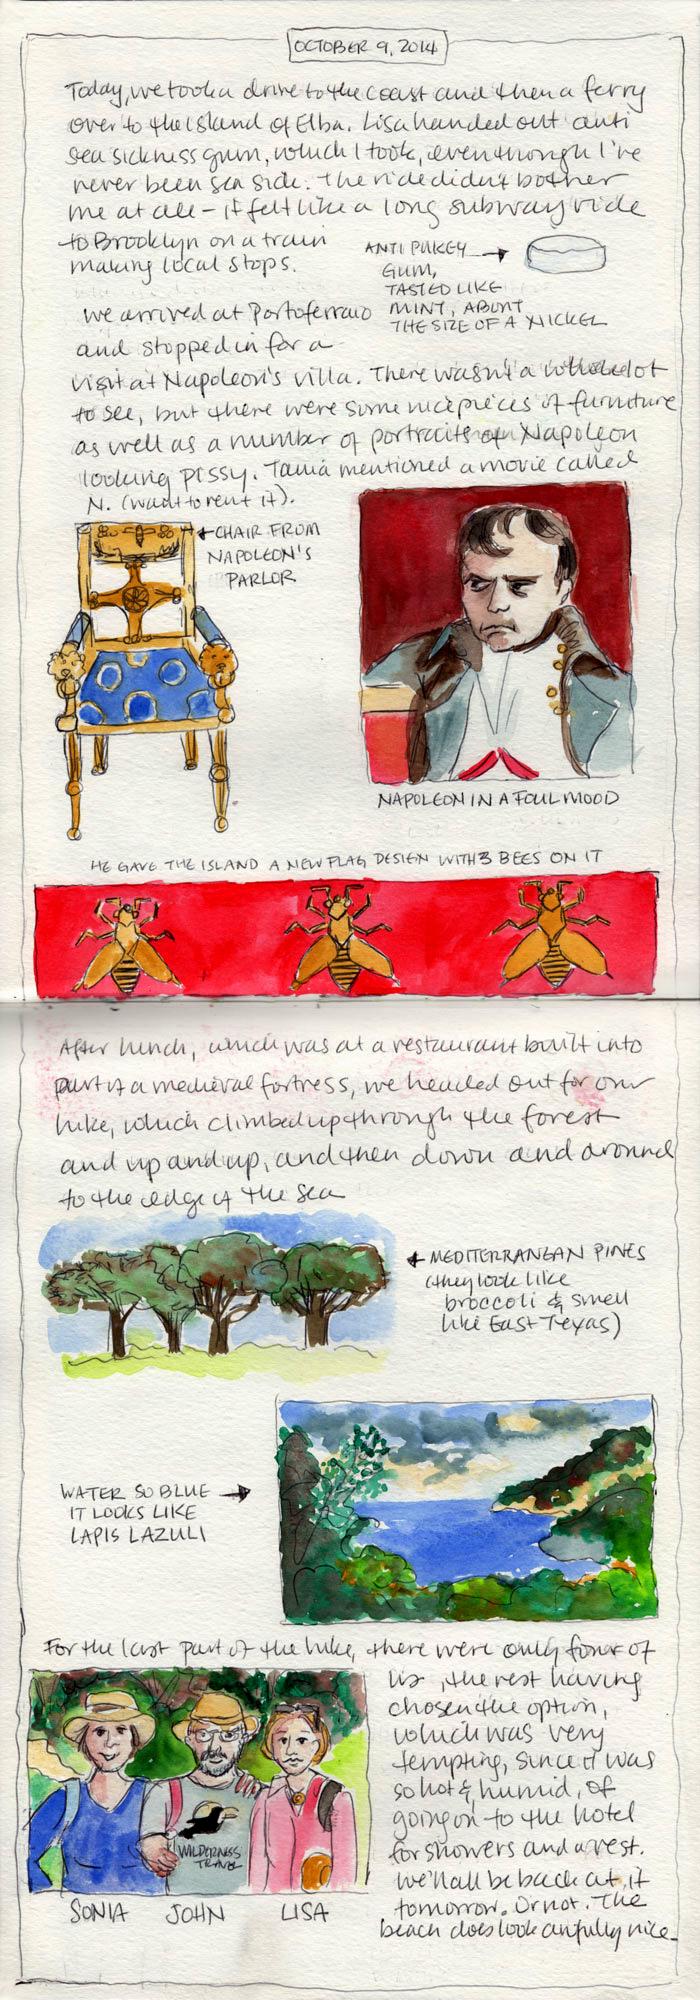 Medieval-Hilltowns-Tuscany-Susanne-Reece-october_9_adj